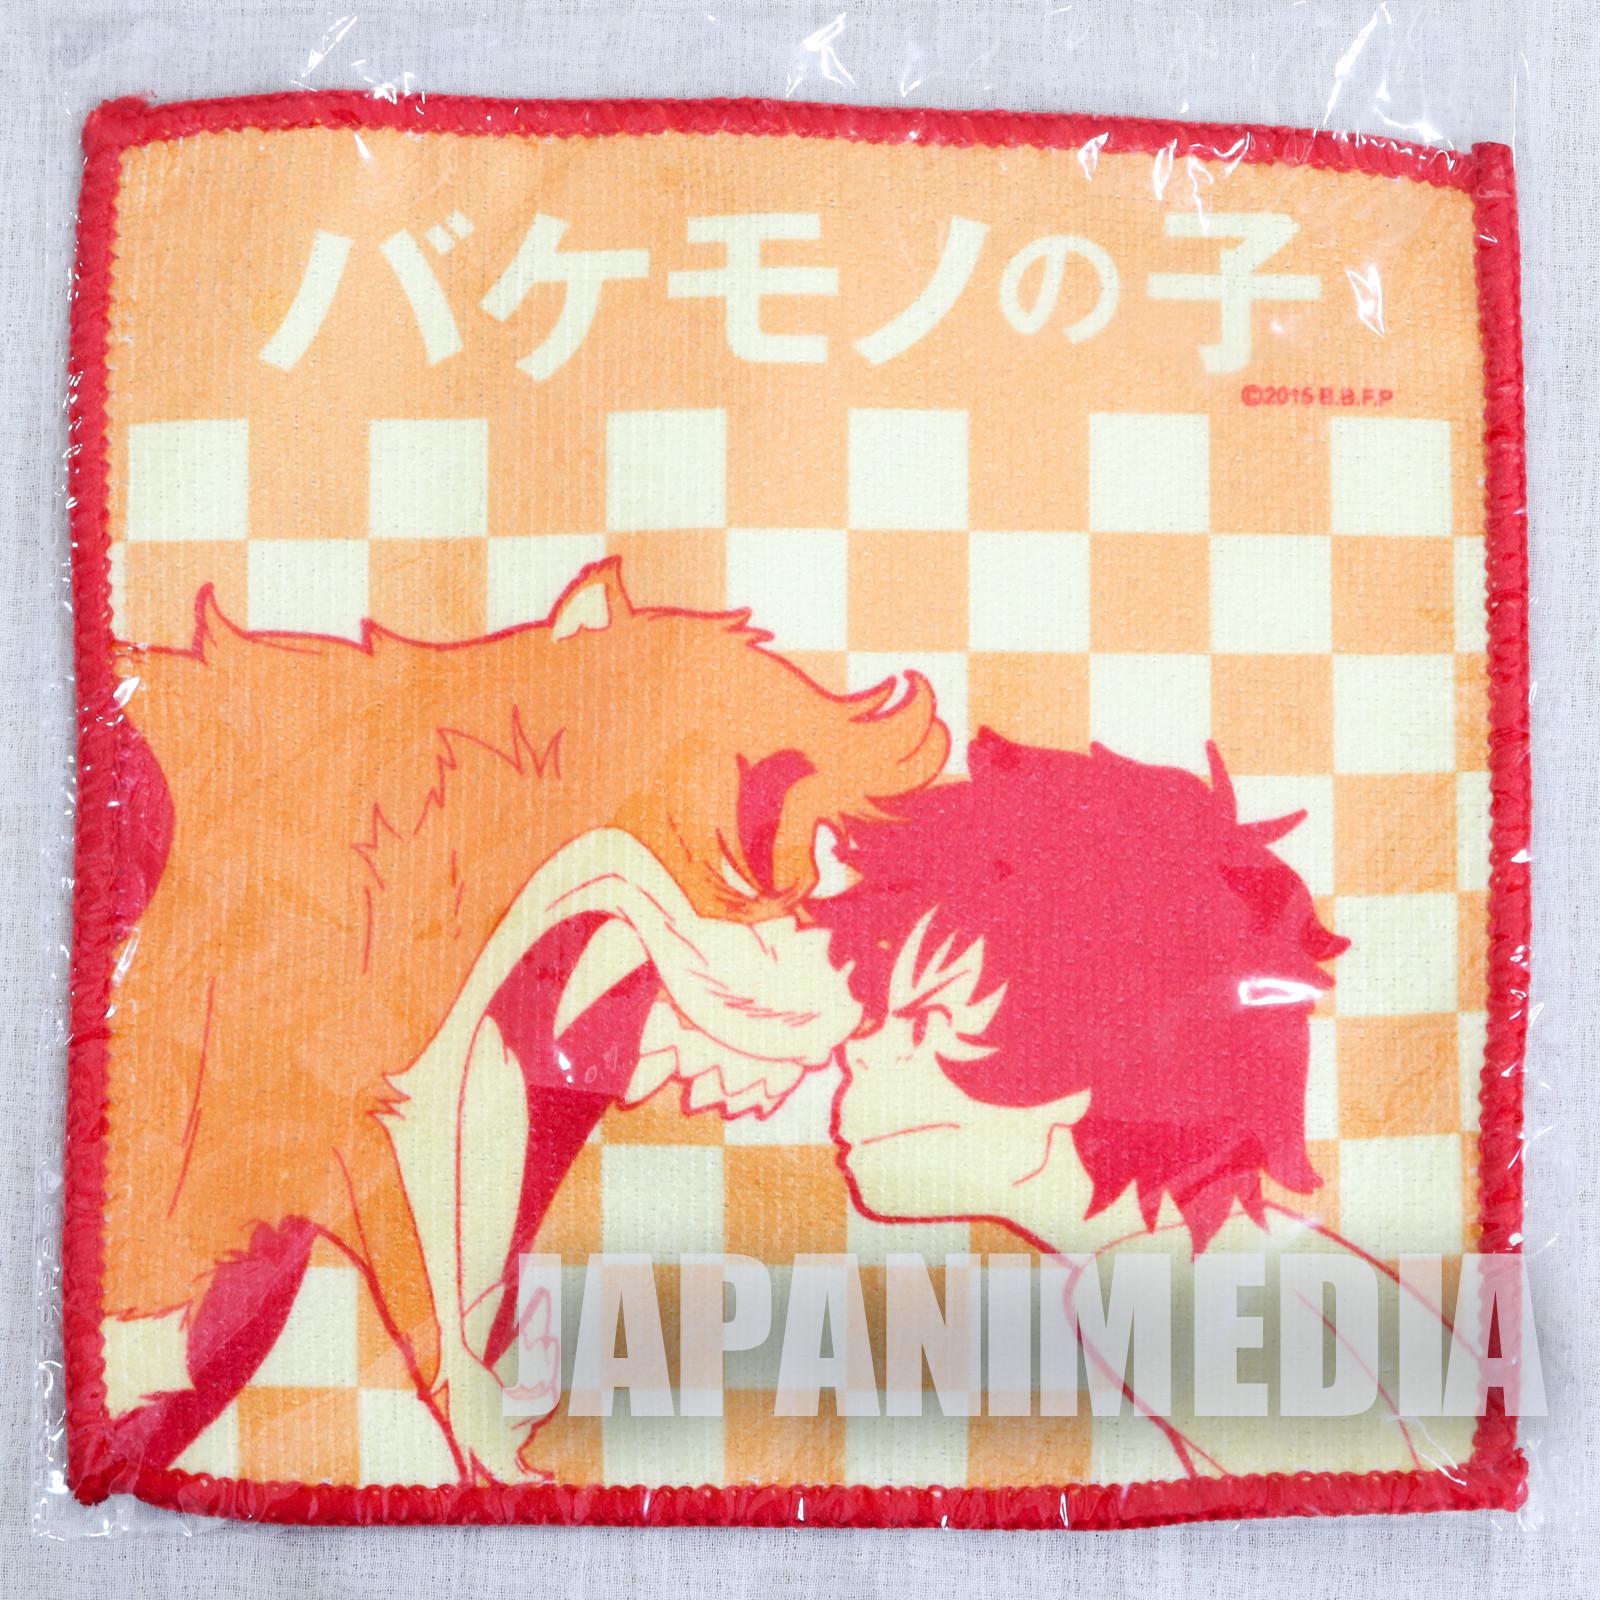 The Boy and The Beast Kyuta & Kumatetsu Hand Towel 7x7 inch JAPAN ANIME